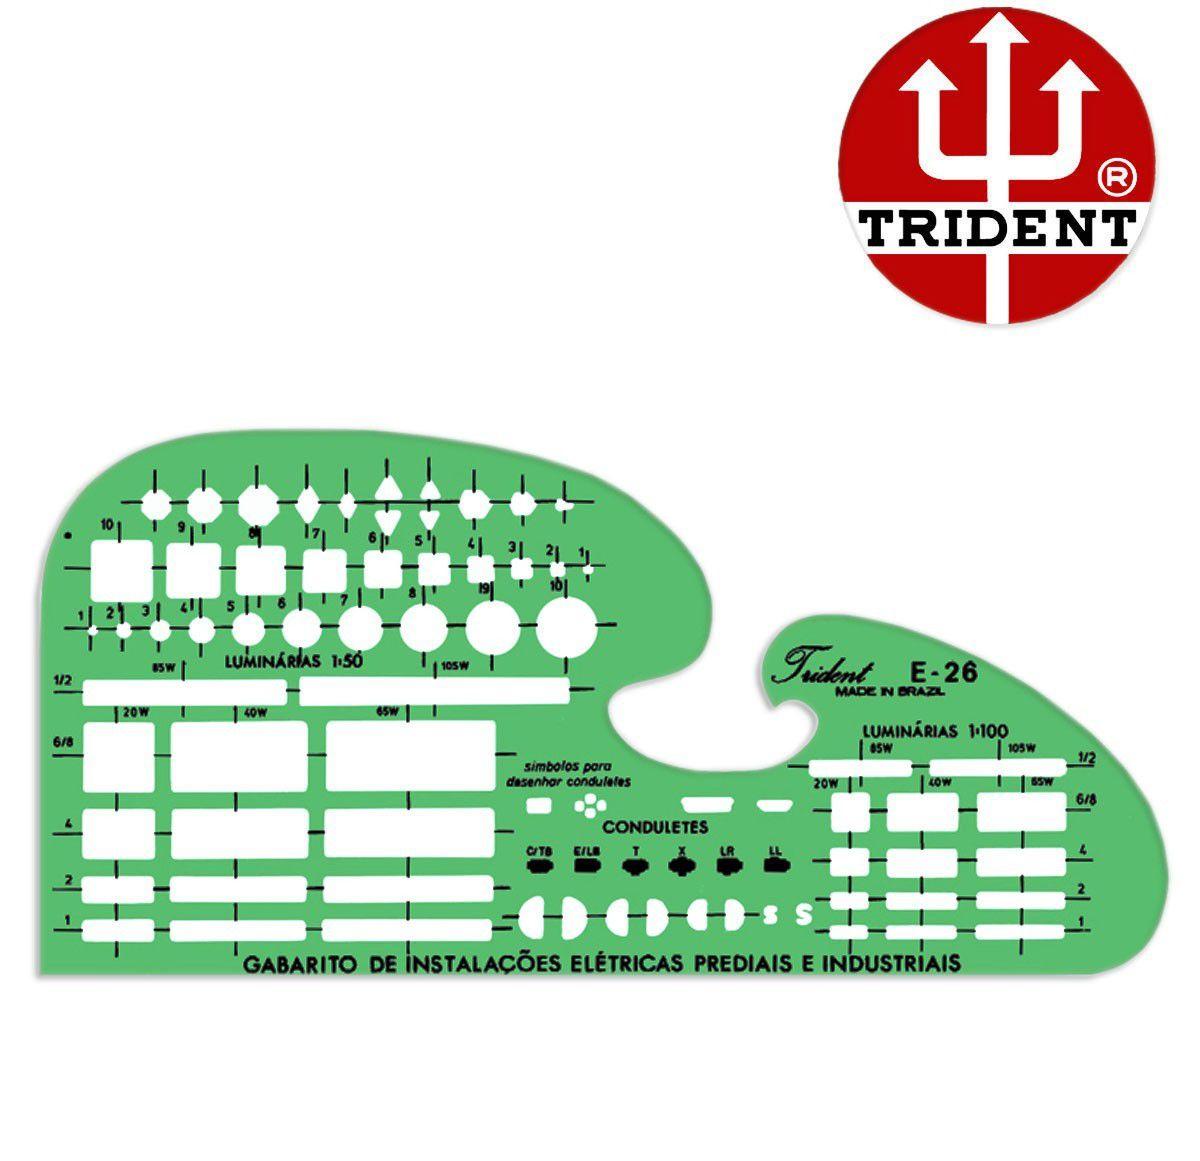 Gabarito Trident Desetec E-26